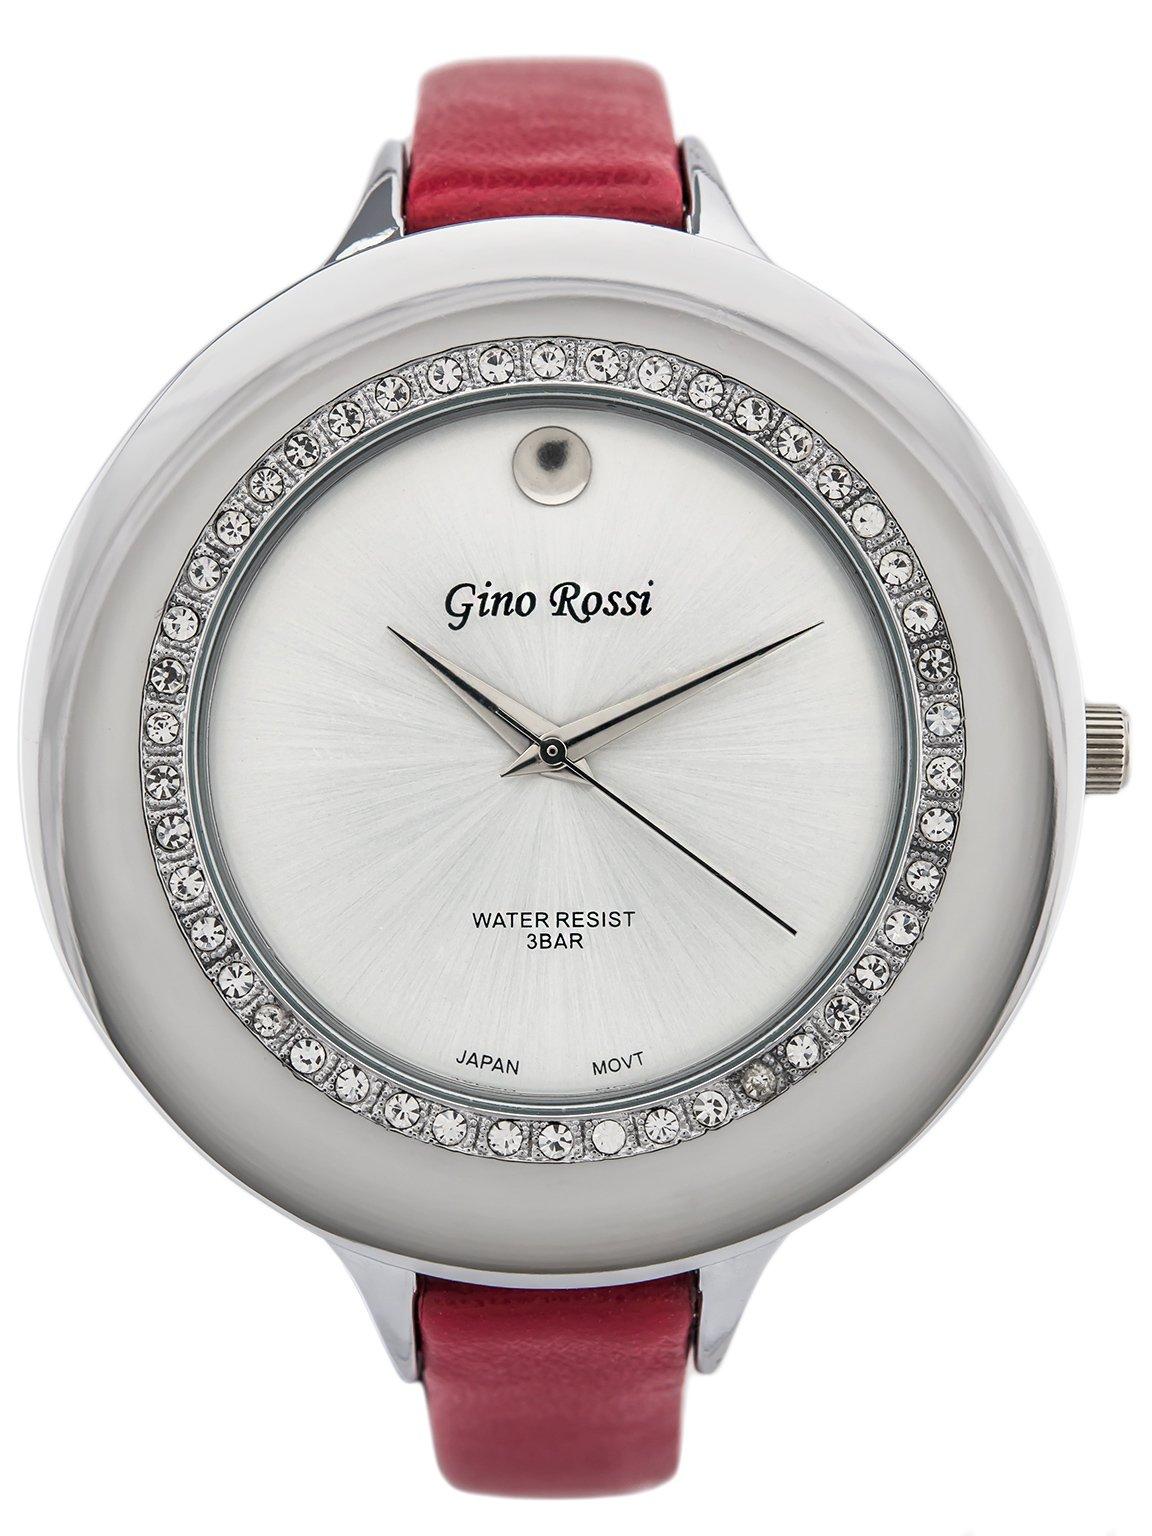 e79f261749c95 Zegarek damski GINO ROSSI 312 7CCS 79,00 zł cena tanio najtaniej ...